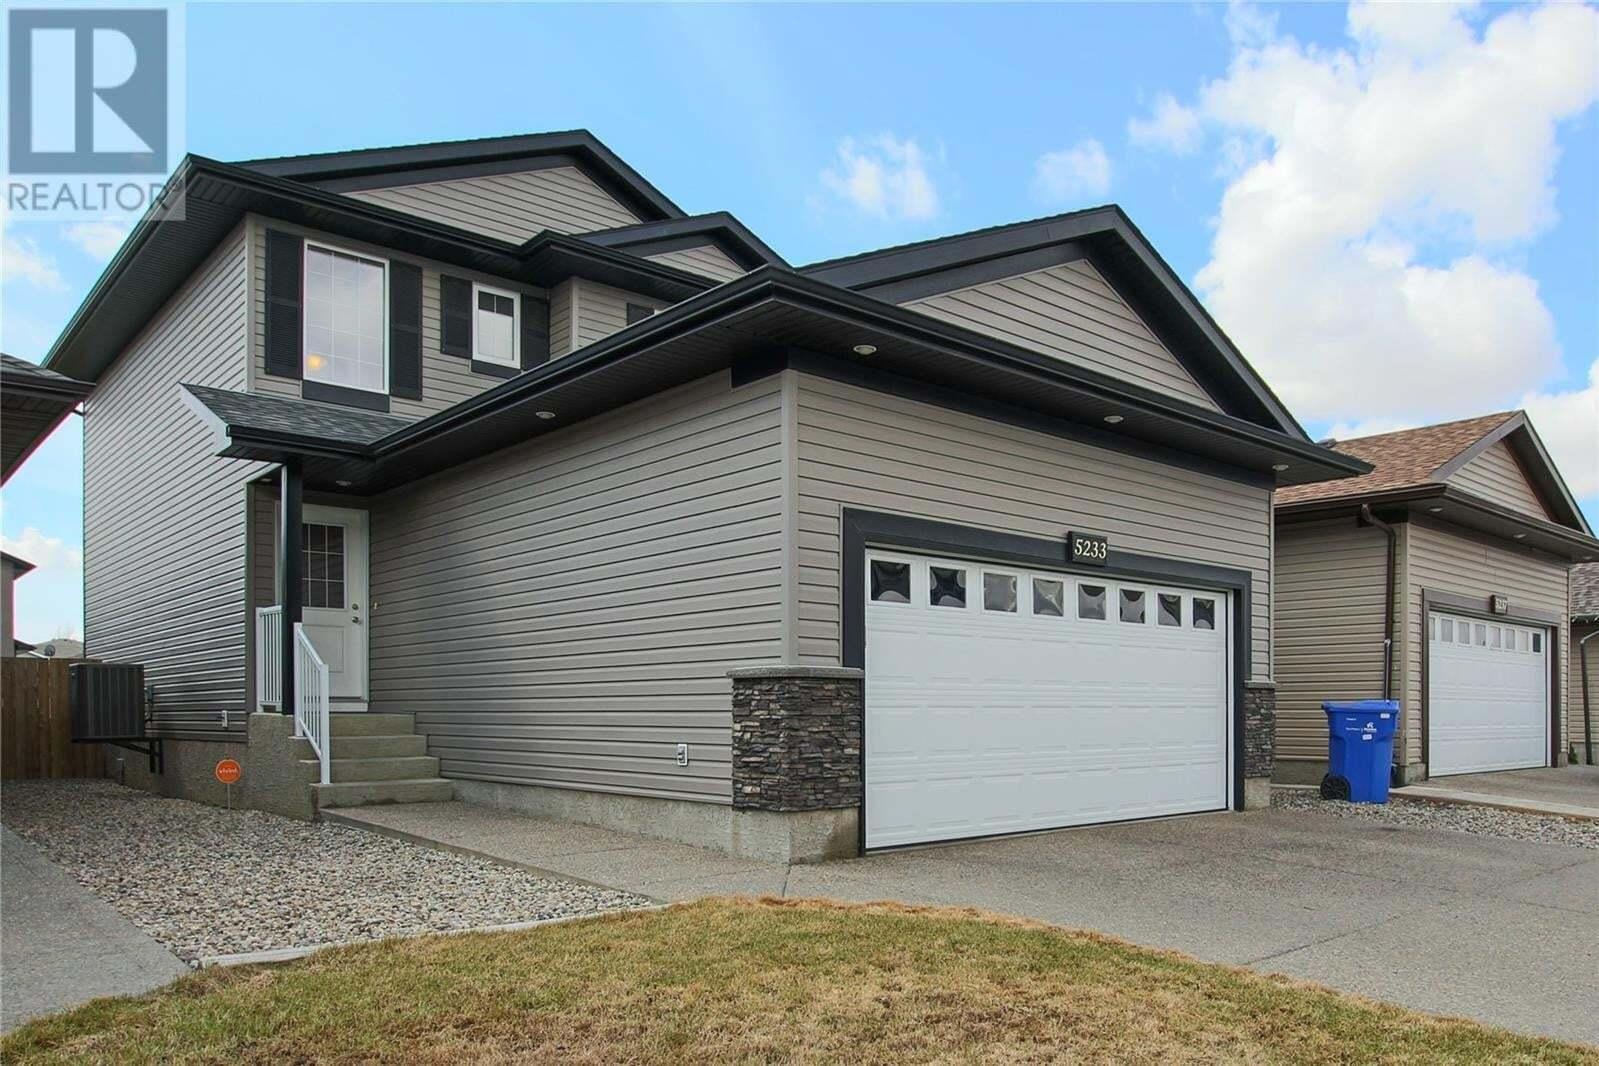 House for sale at 5233 Anthony Wy Regina Saskatchewan - MLS: SK808442